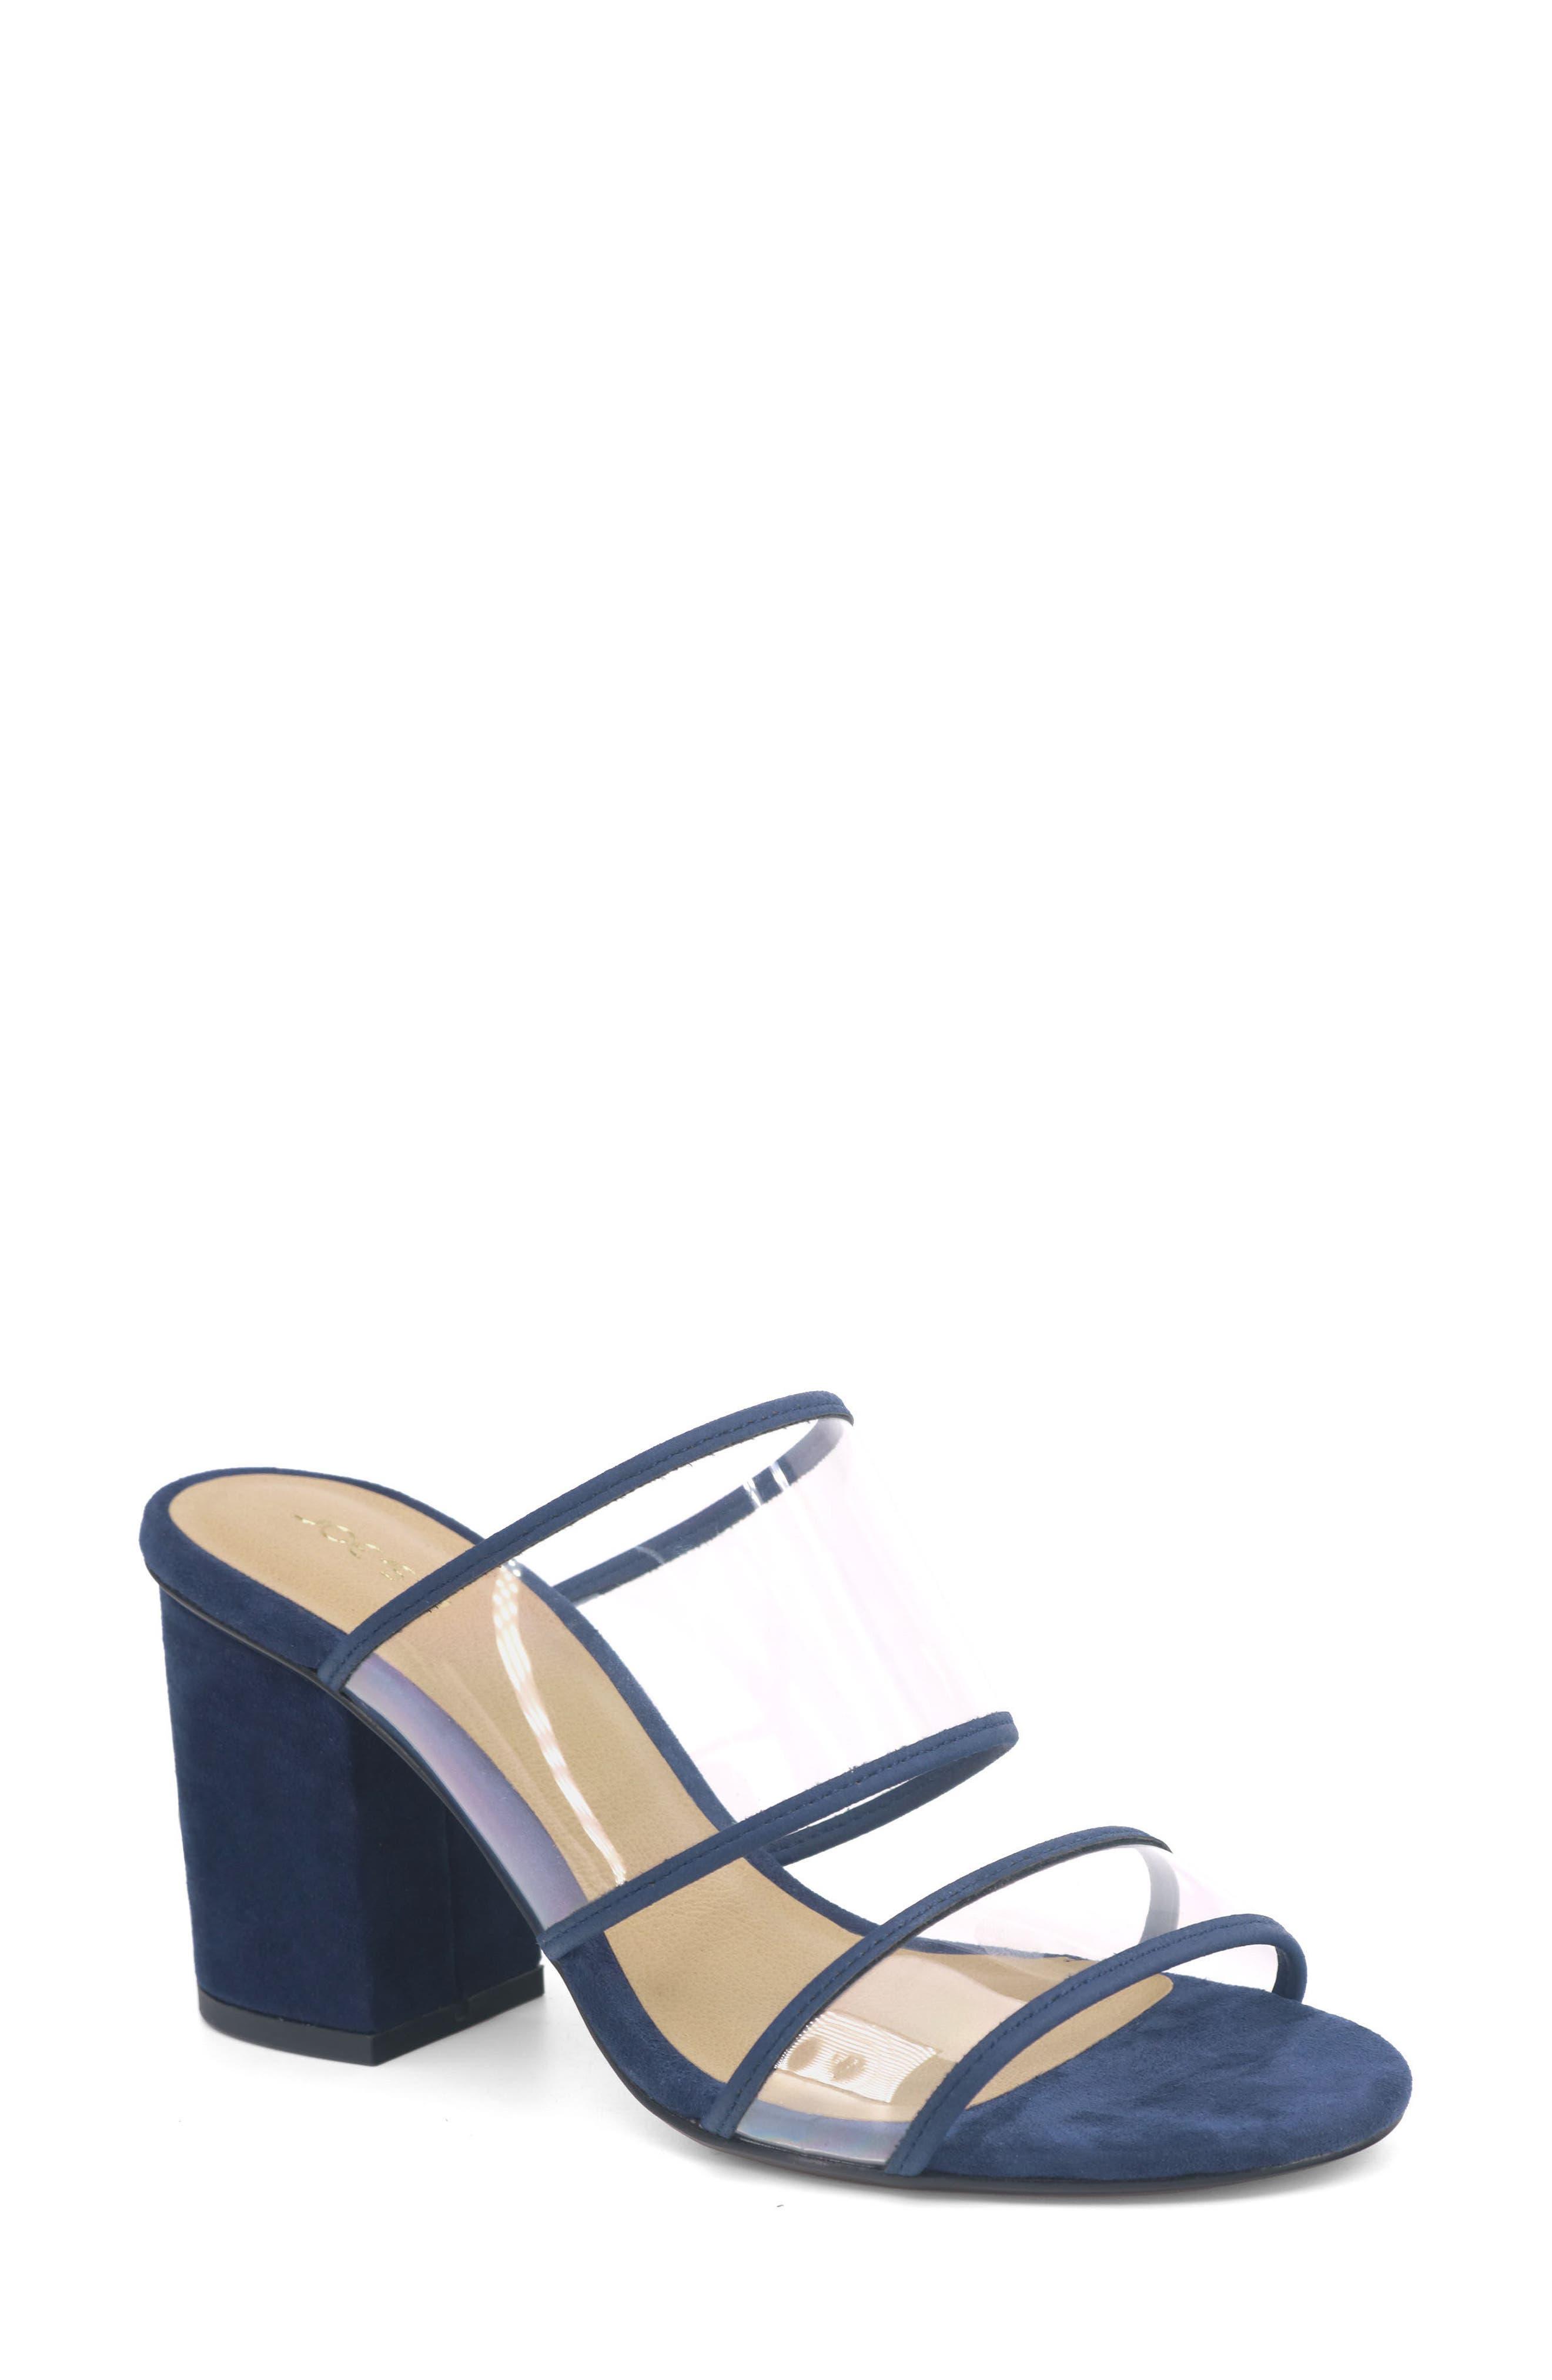 JOE'S Janette Sandal, Main, color, 410